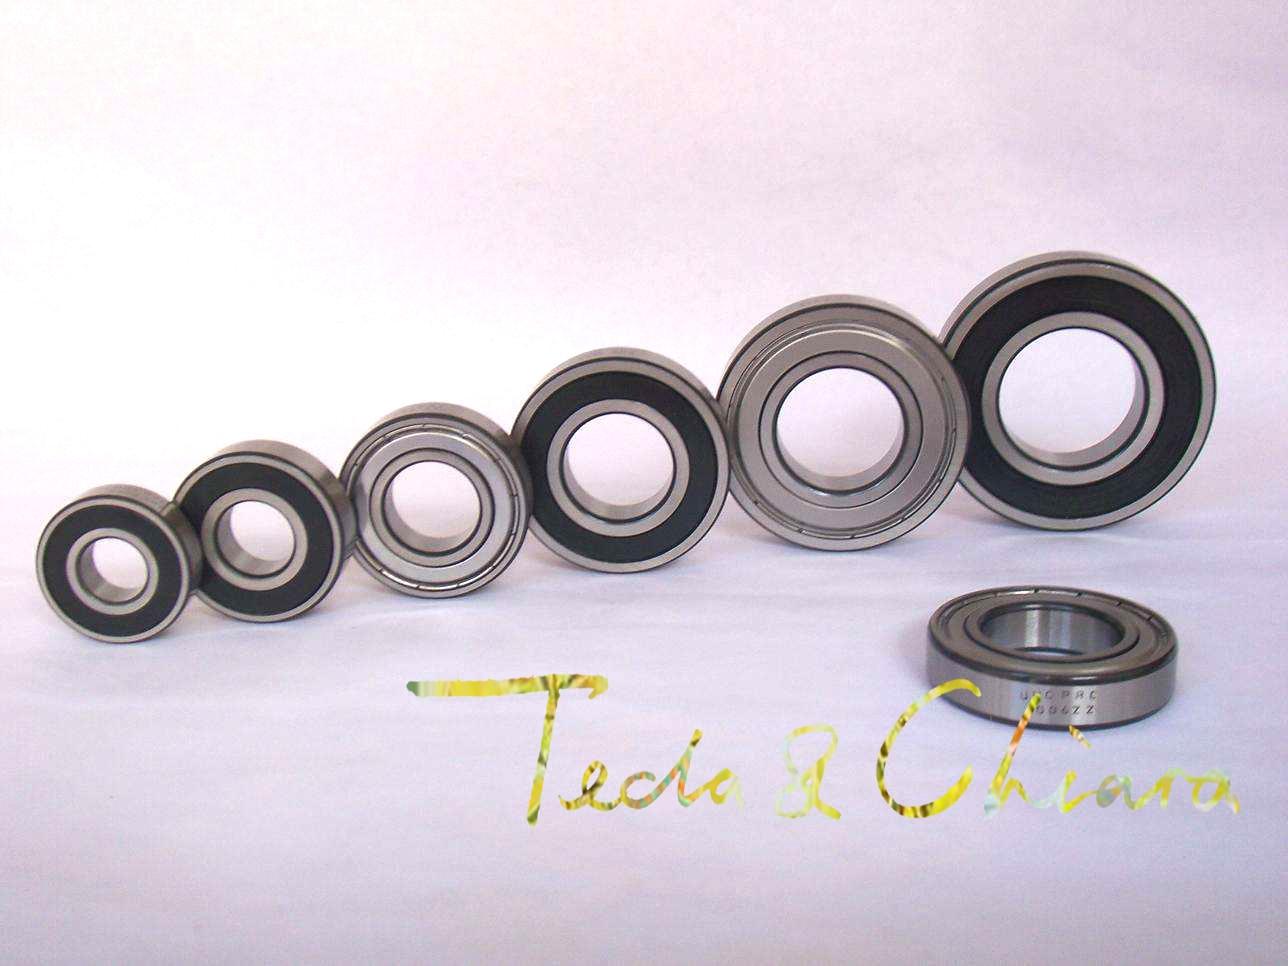 6003 6003ZZ 6003RS 6003-2Z 6003Z 6003-2RS ZZ RS RZ 2RZ Deep Groove Ball Bearings 17 x 35 x 10mm High Quality 6000 6000zz 6000rs 6000 2z 6000z 6000 2rs zz rs rz 2rz deep groove ball bearings 10 x 26 x 8mm high quality